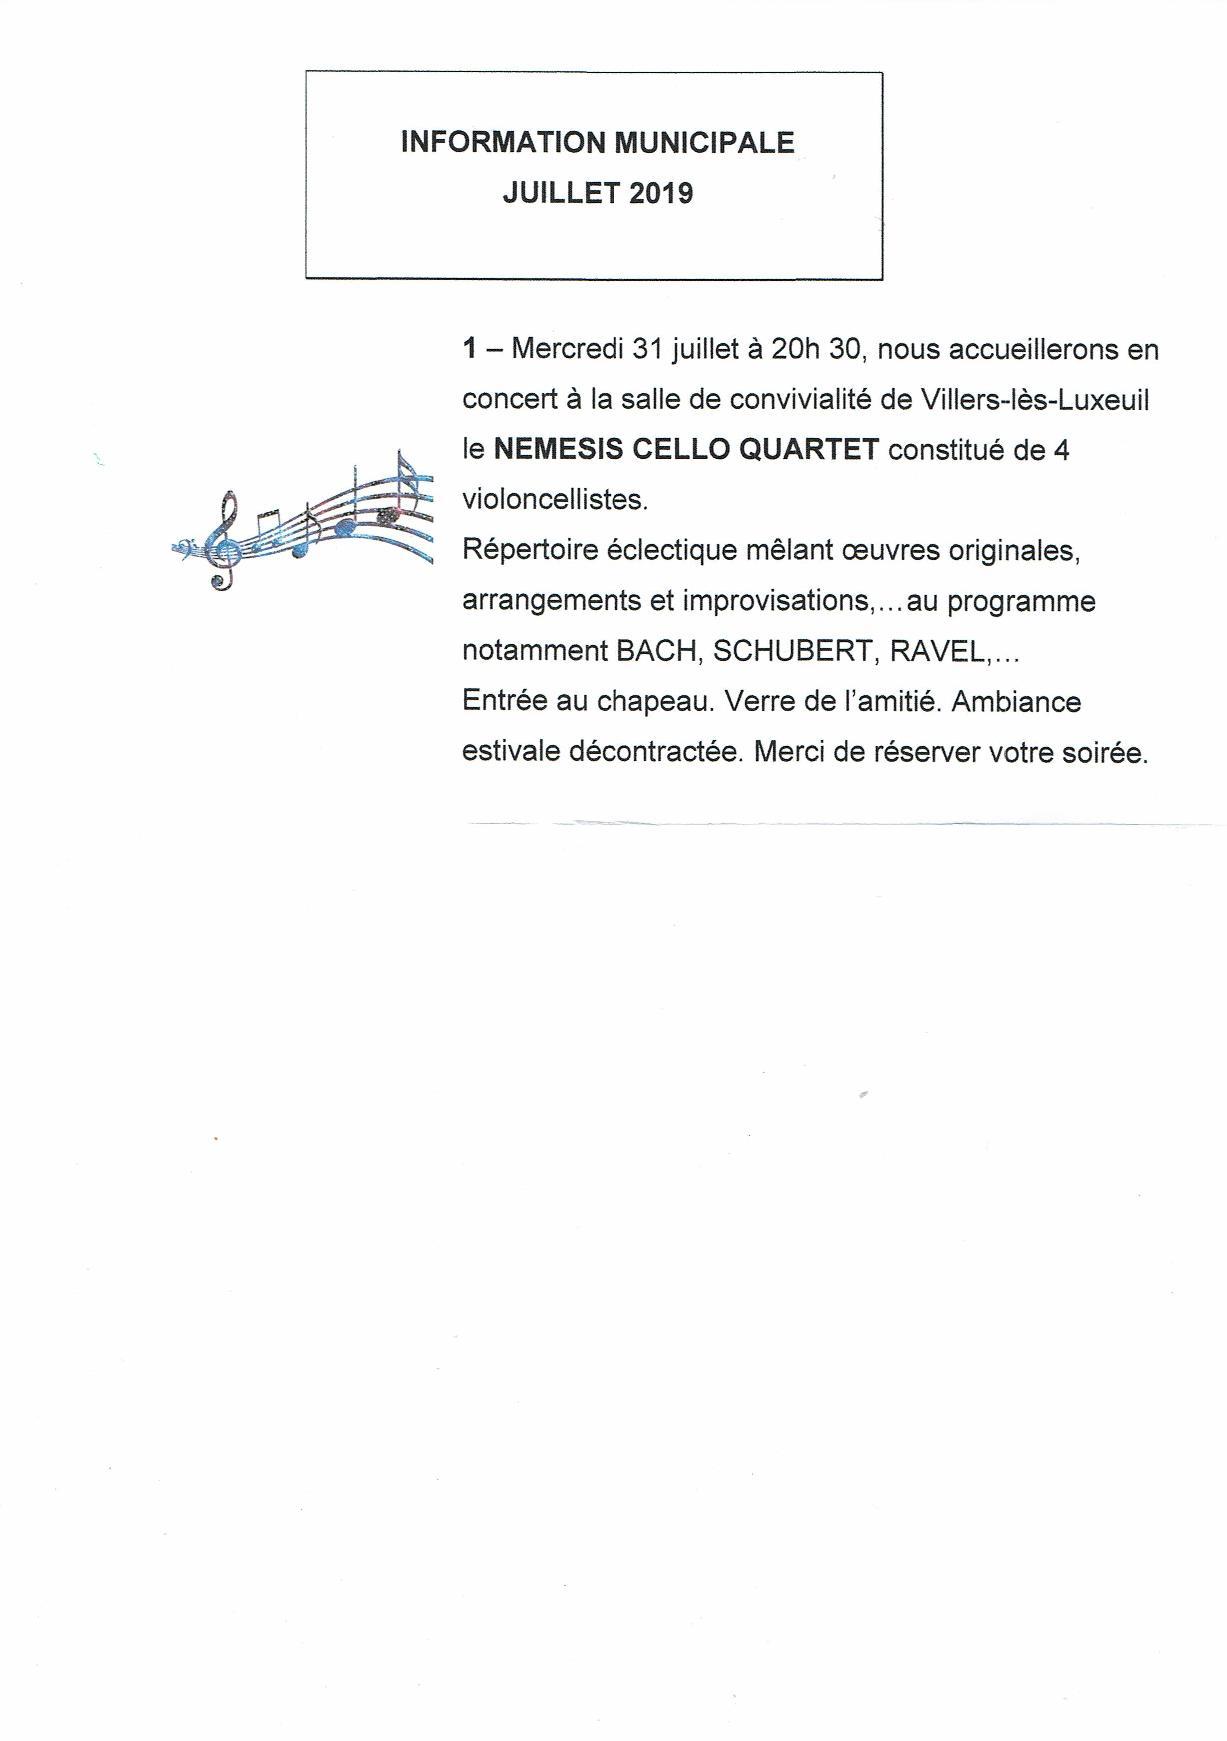 https://www.villers-les-luxeuil.com/projets/villers/files/images/2019_Flyers_Tracts/Concert_du_31_juillet_2019_page_003.jpg